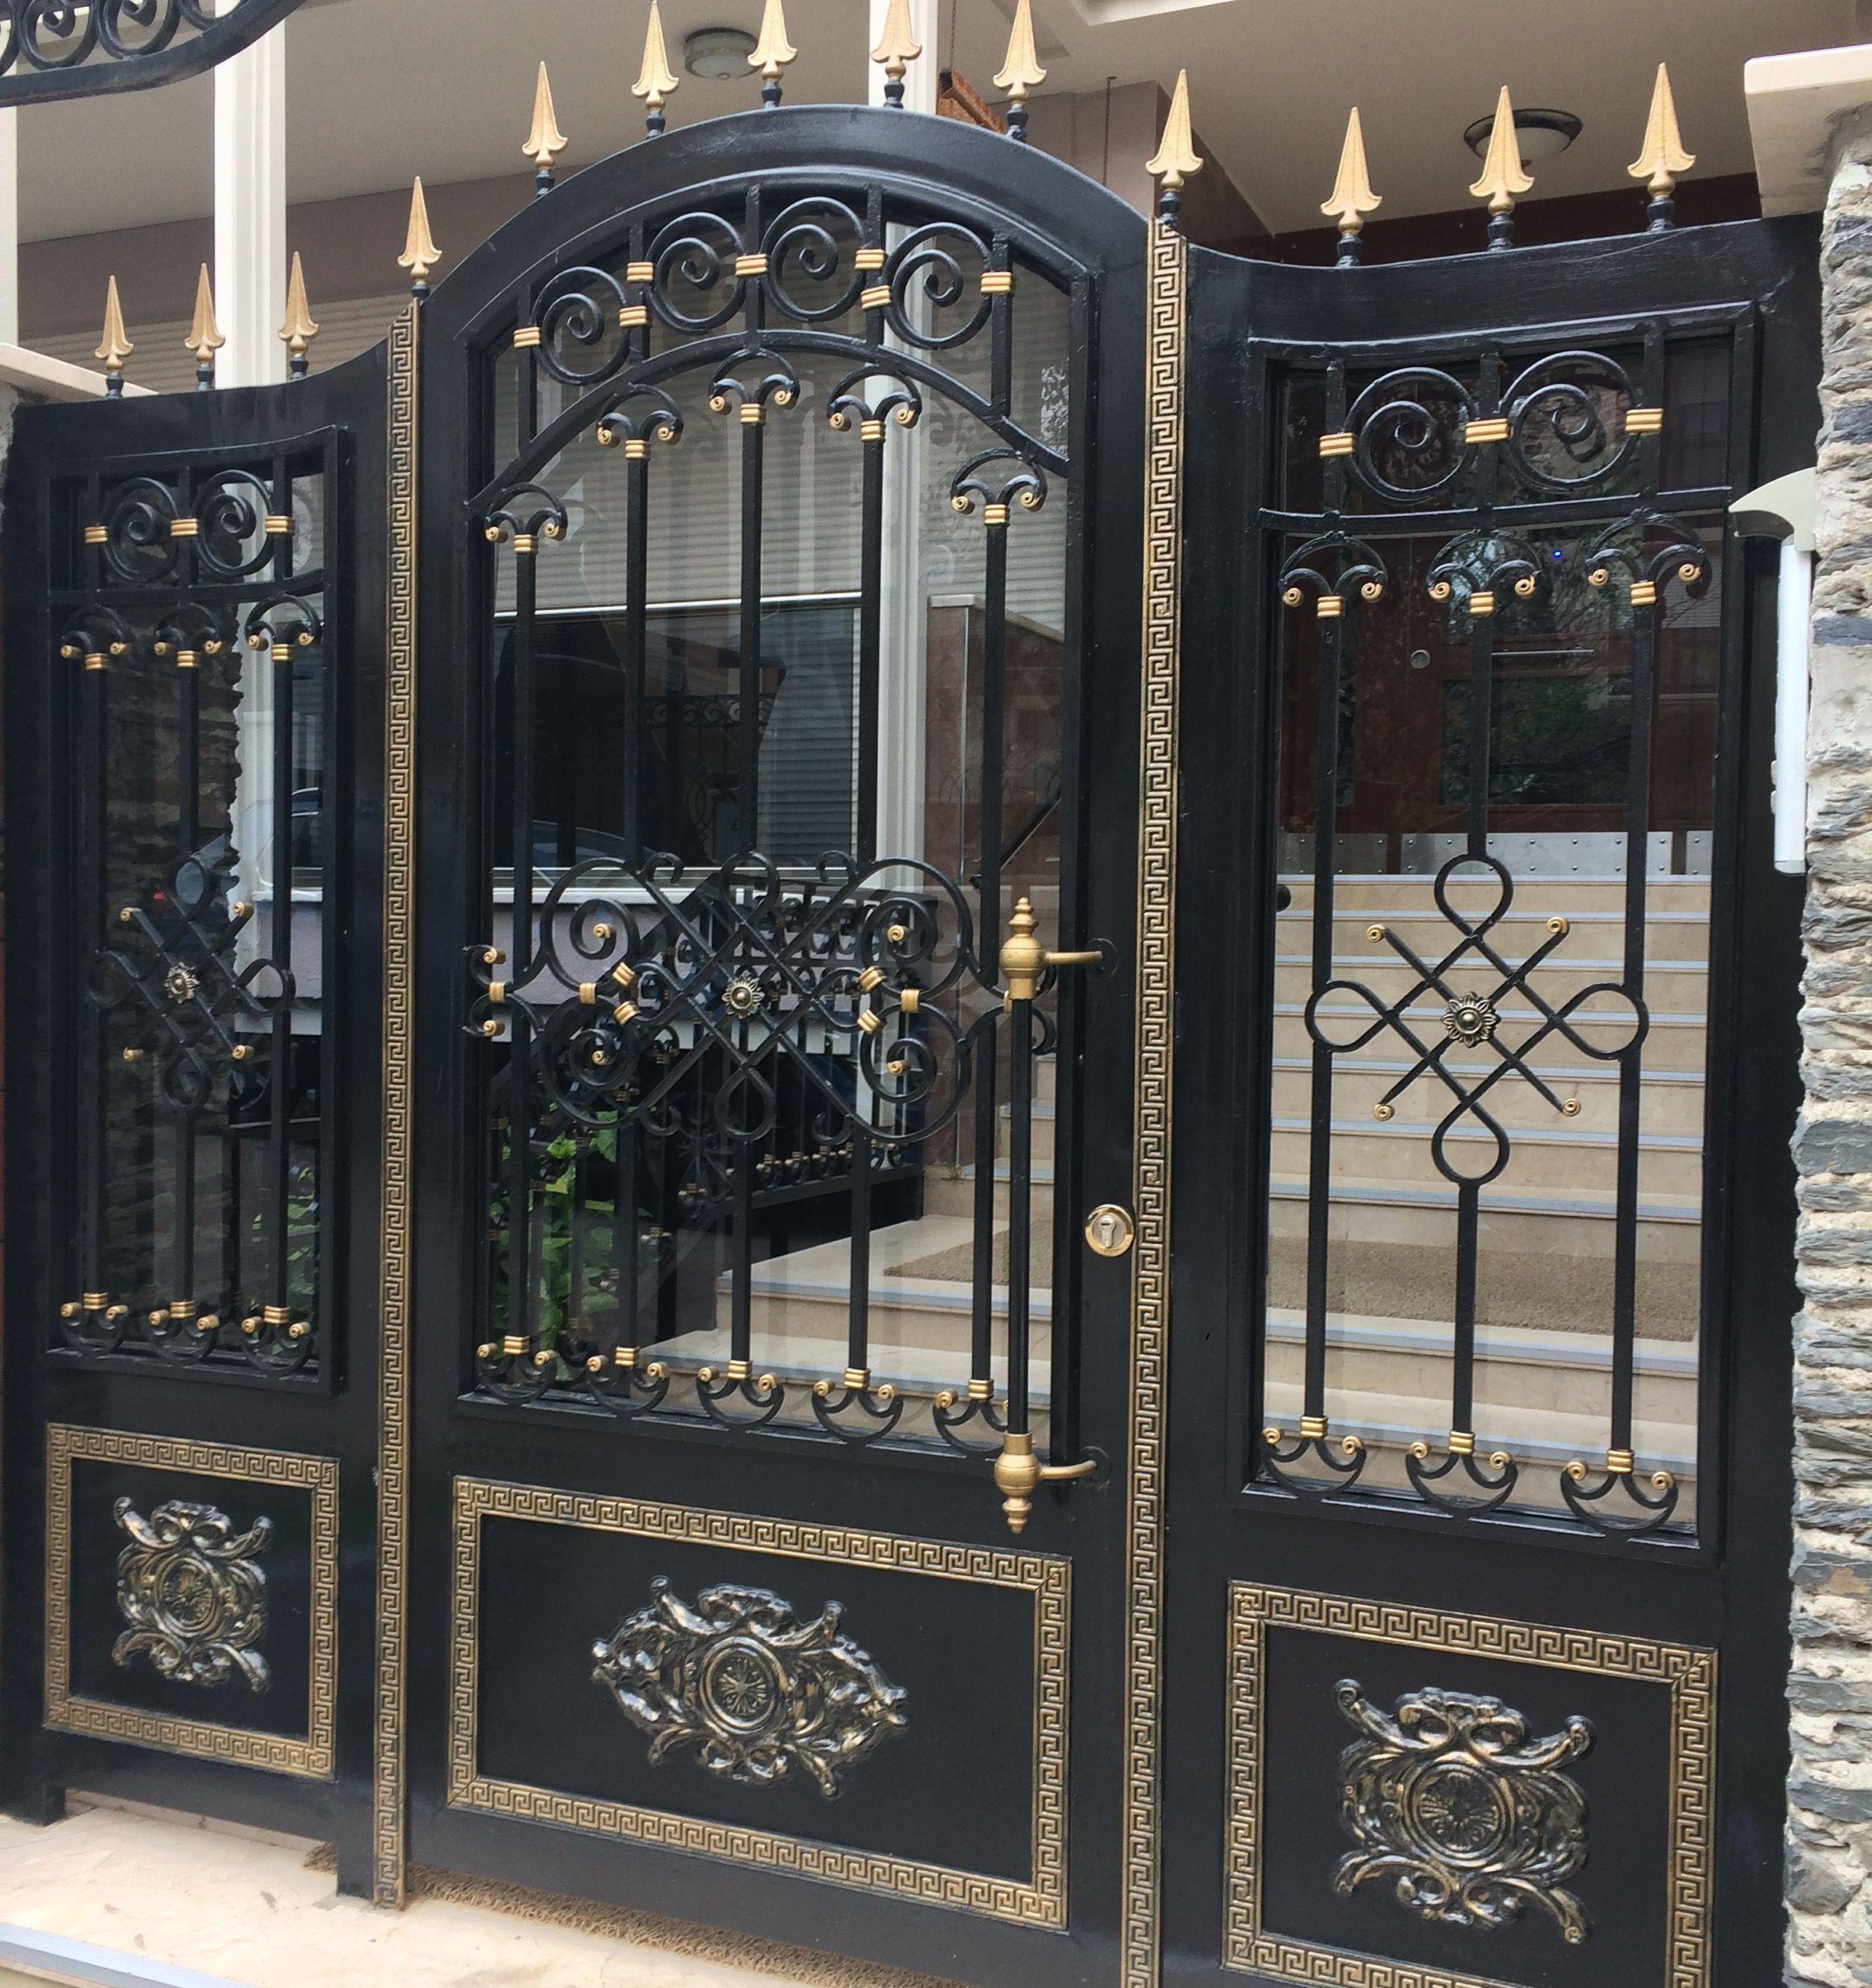 Square Tubing For Carport 2020 In 2020 Steel Gate Design Gate Design Gate Designs Modern